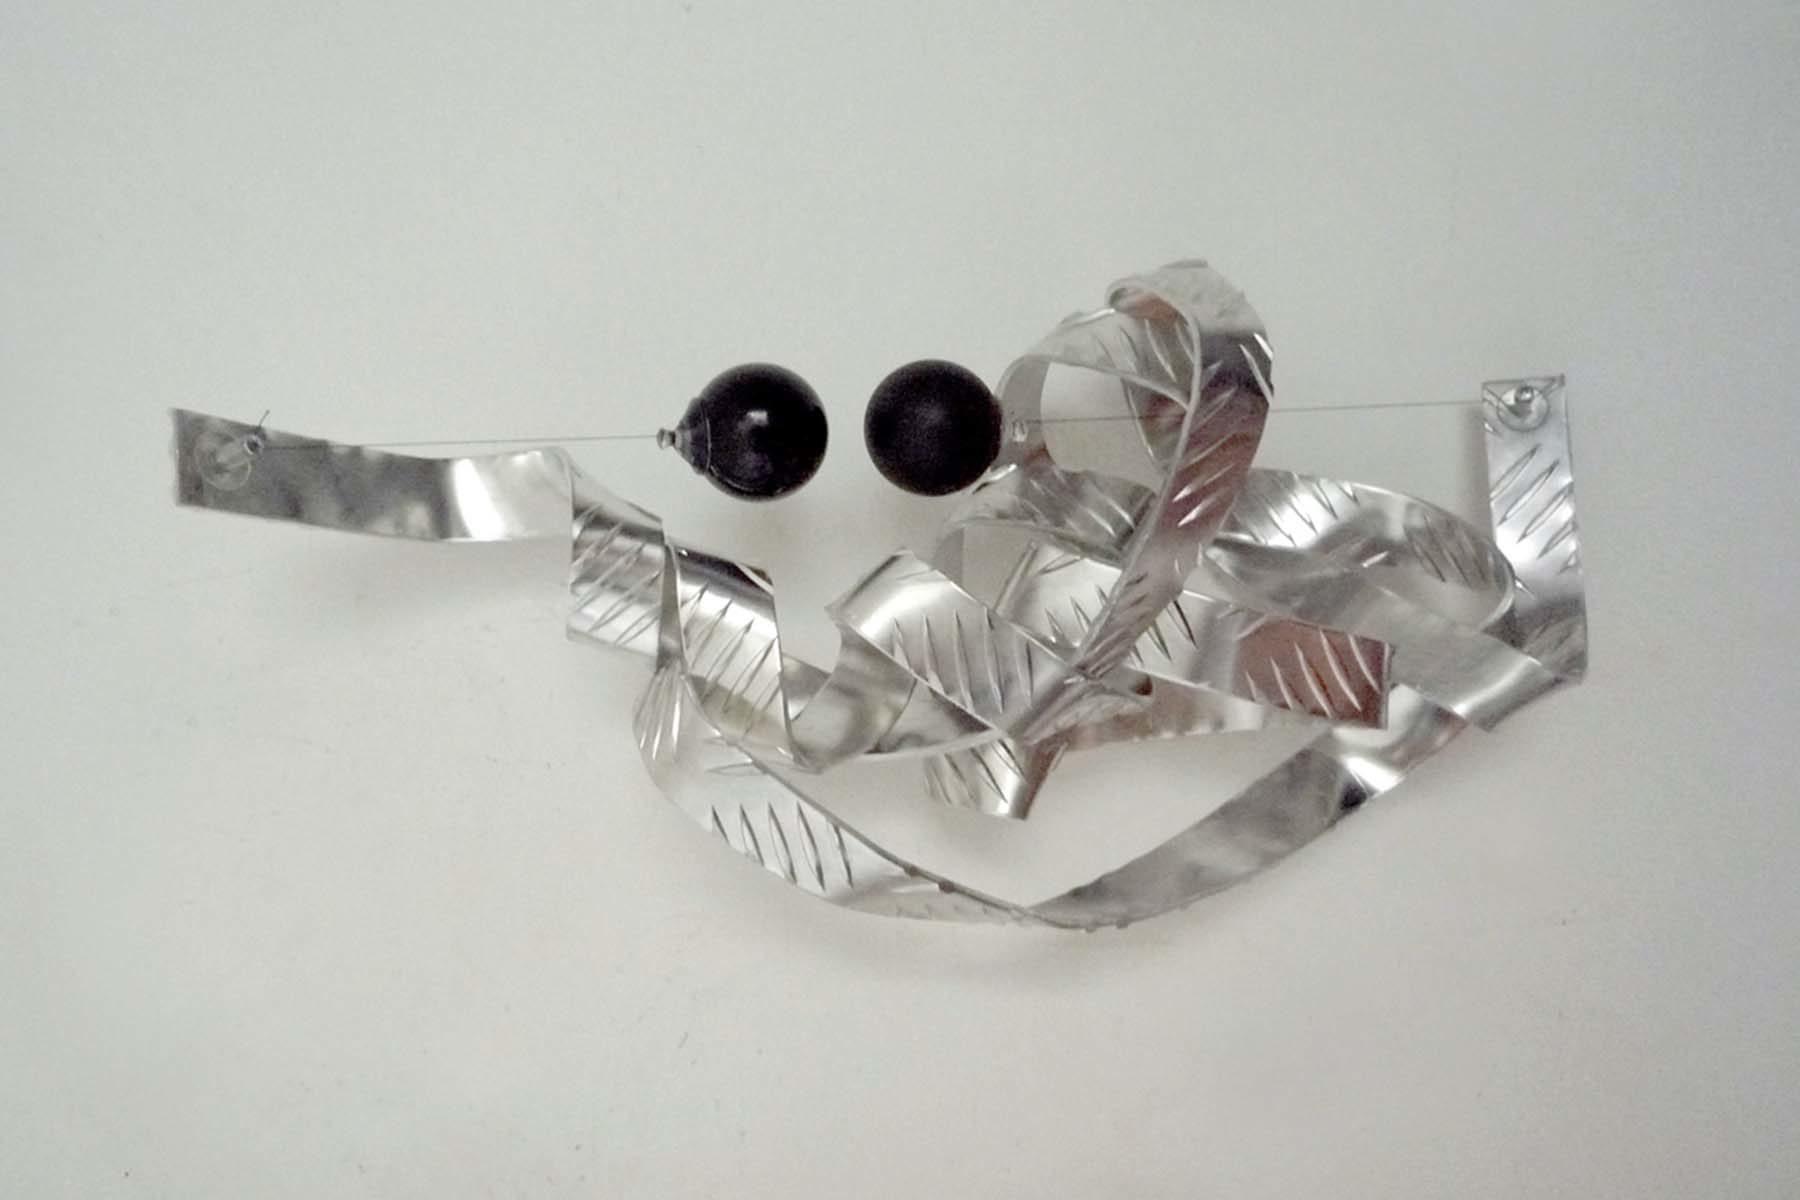 L. Pozzi, String #07, 2010, alluminium, magnet, nylon, ping pong balls, suction cup, 60 x 40 x 20 cm